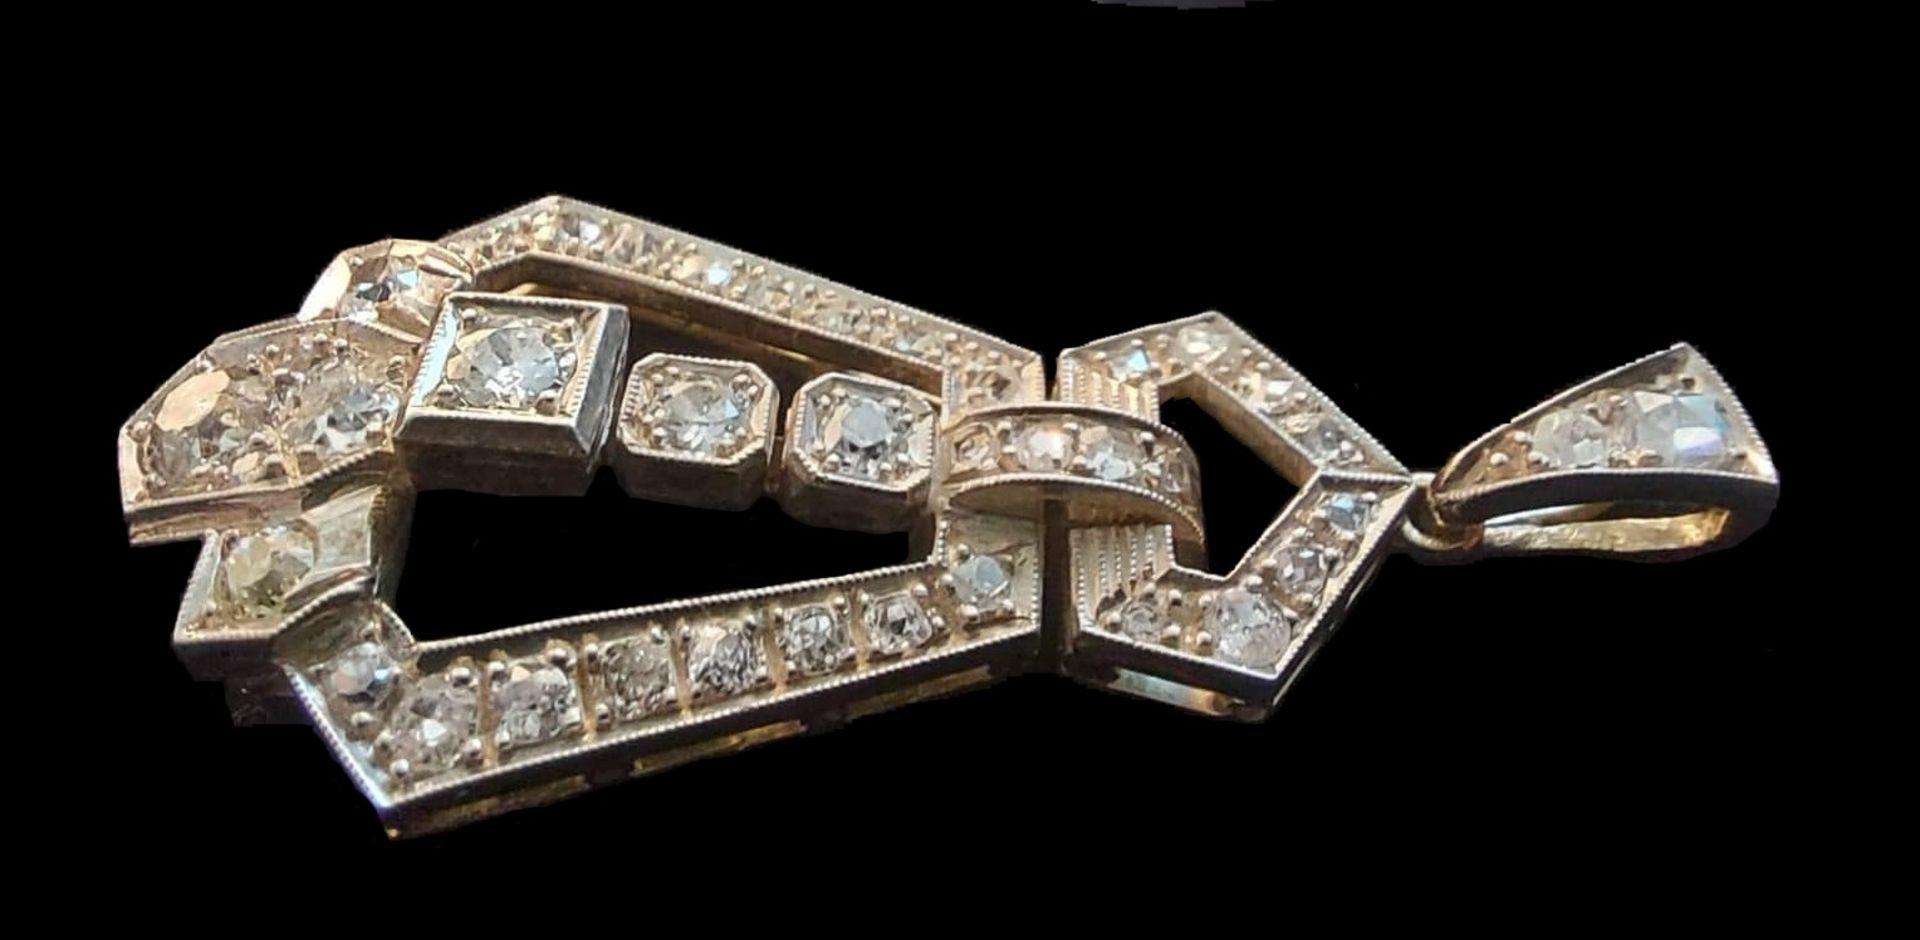 Diamond Pendant | Art - Deco - Image 5 of 5